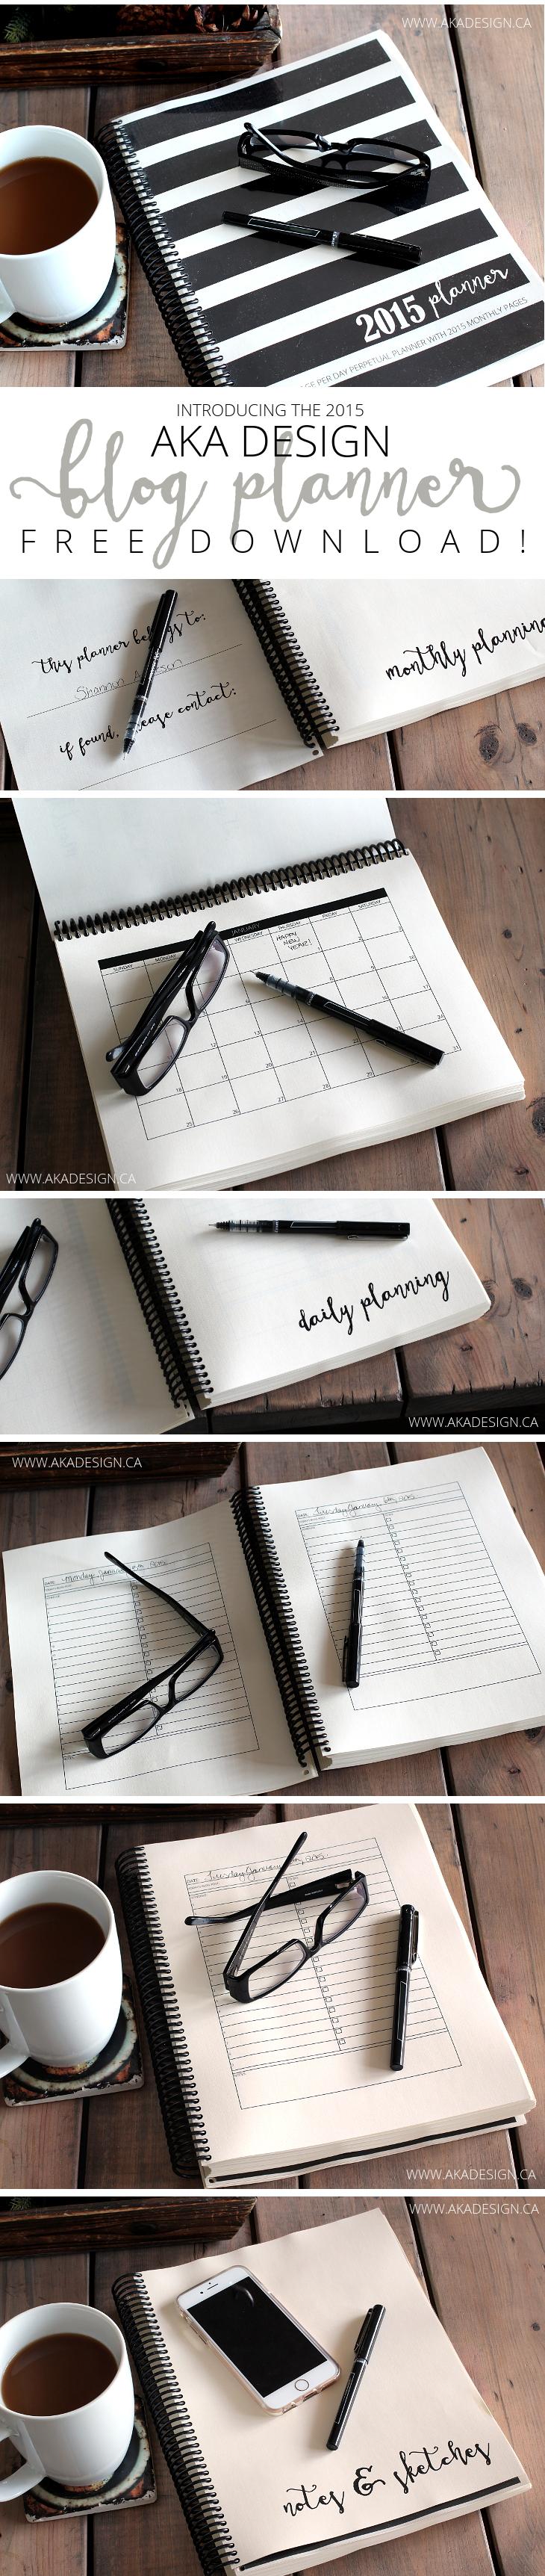 Organizing-Printables-6